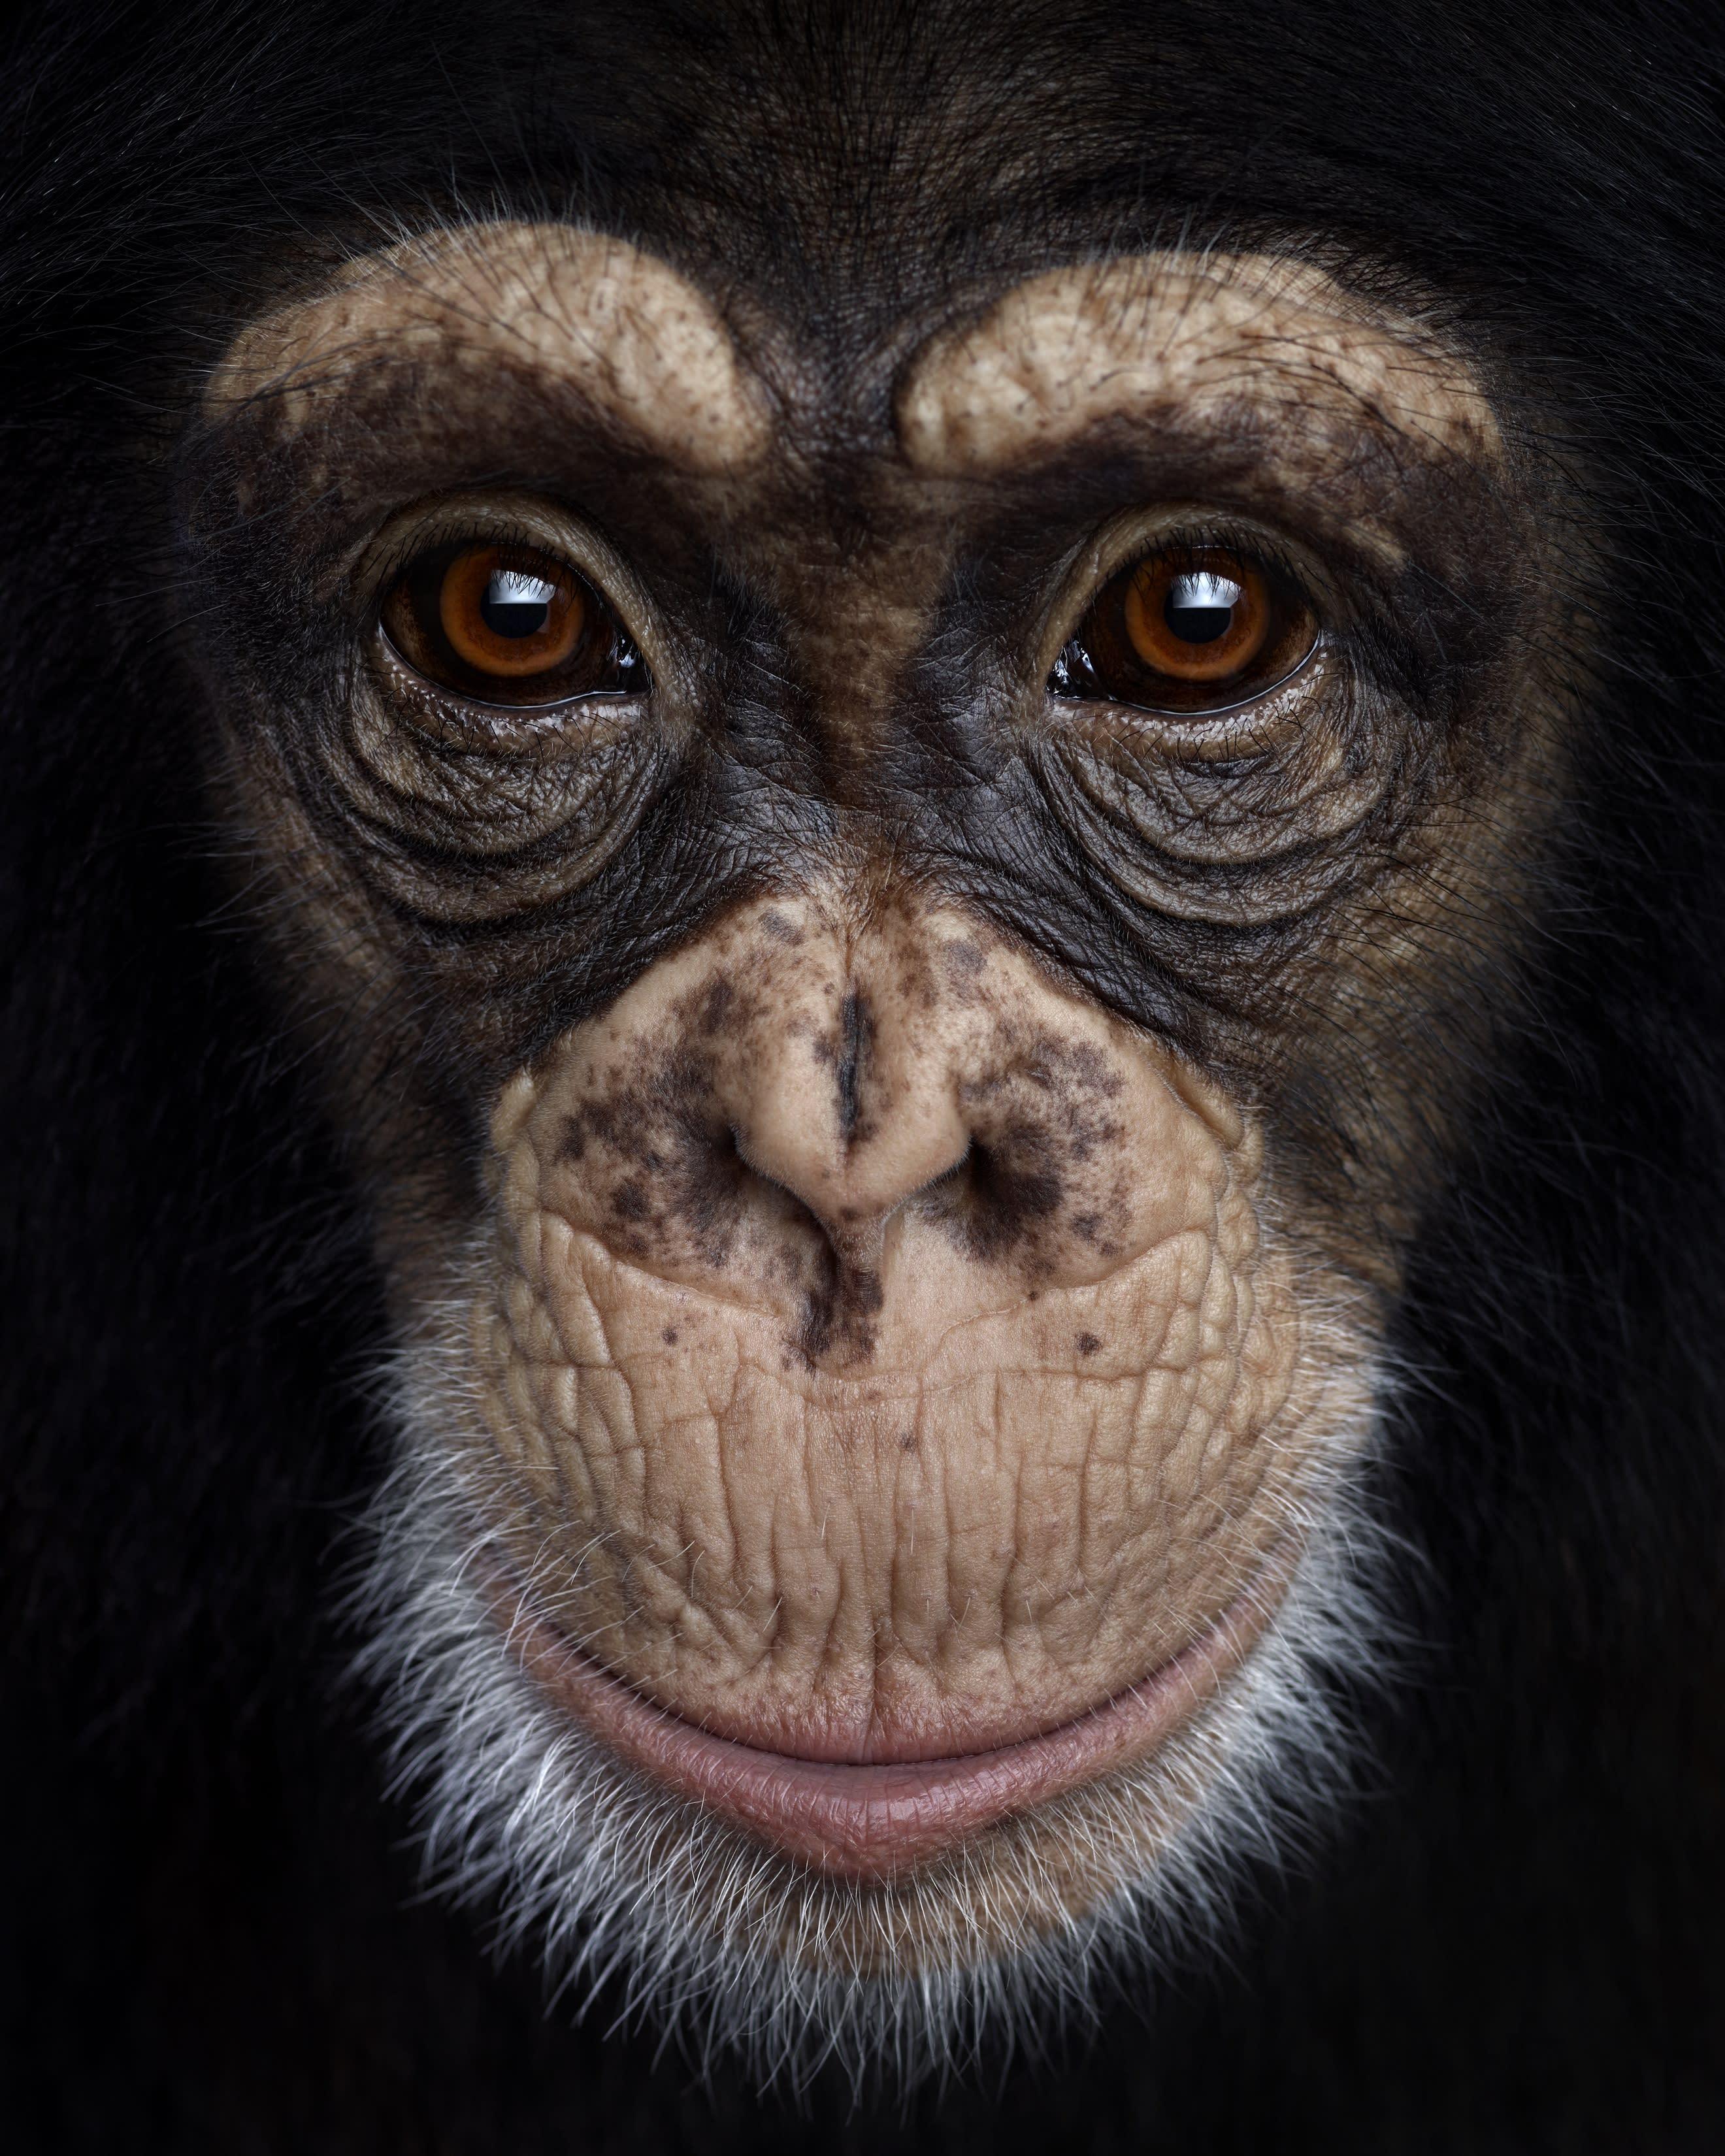 Stunning close-up animal photo portraits